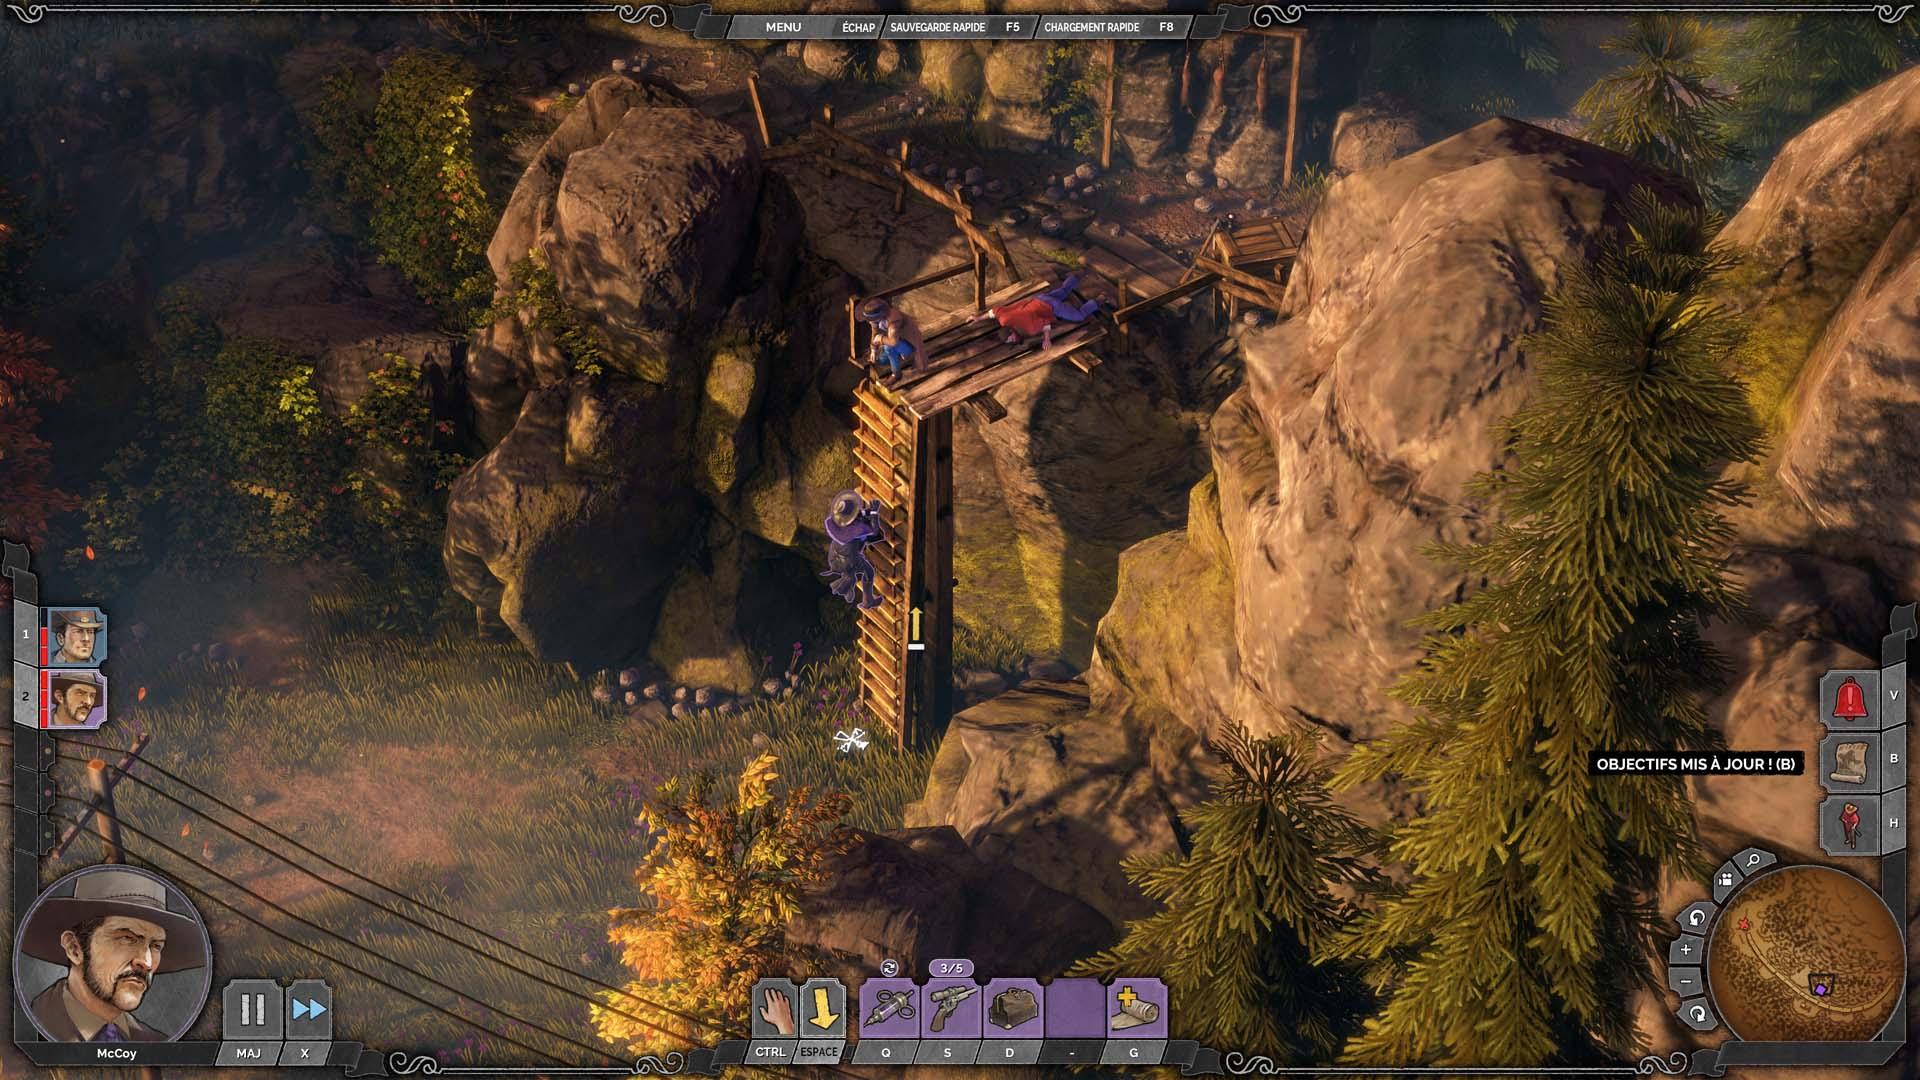 Desperados-Screenshot-Gameblog-Test -15-